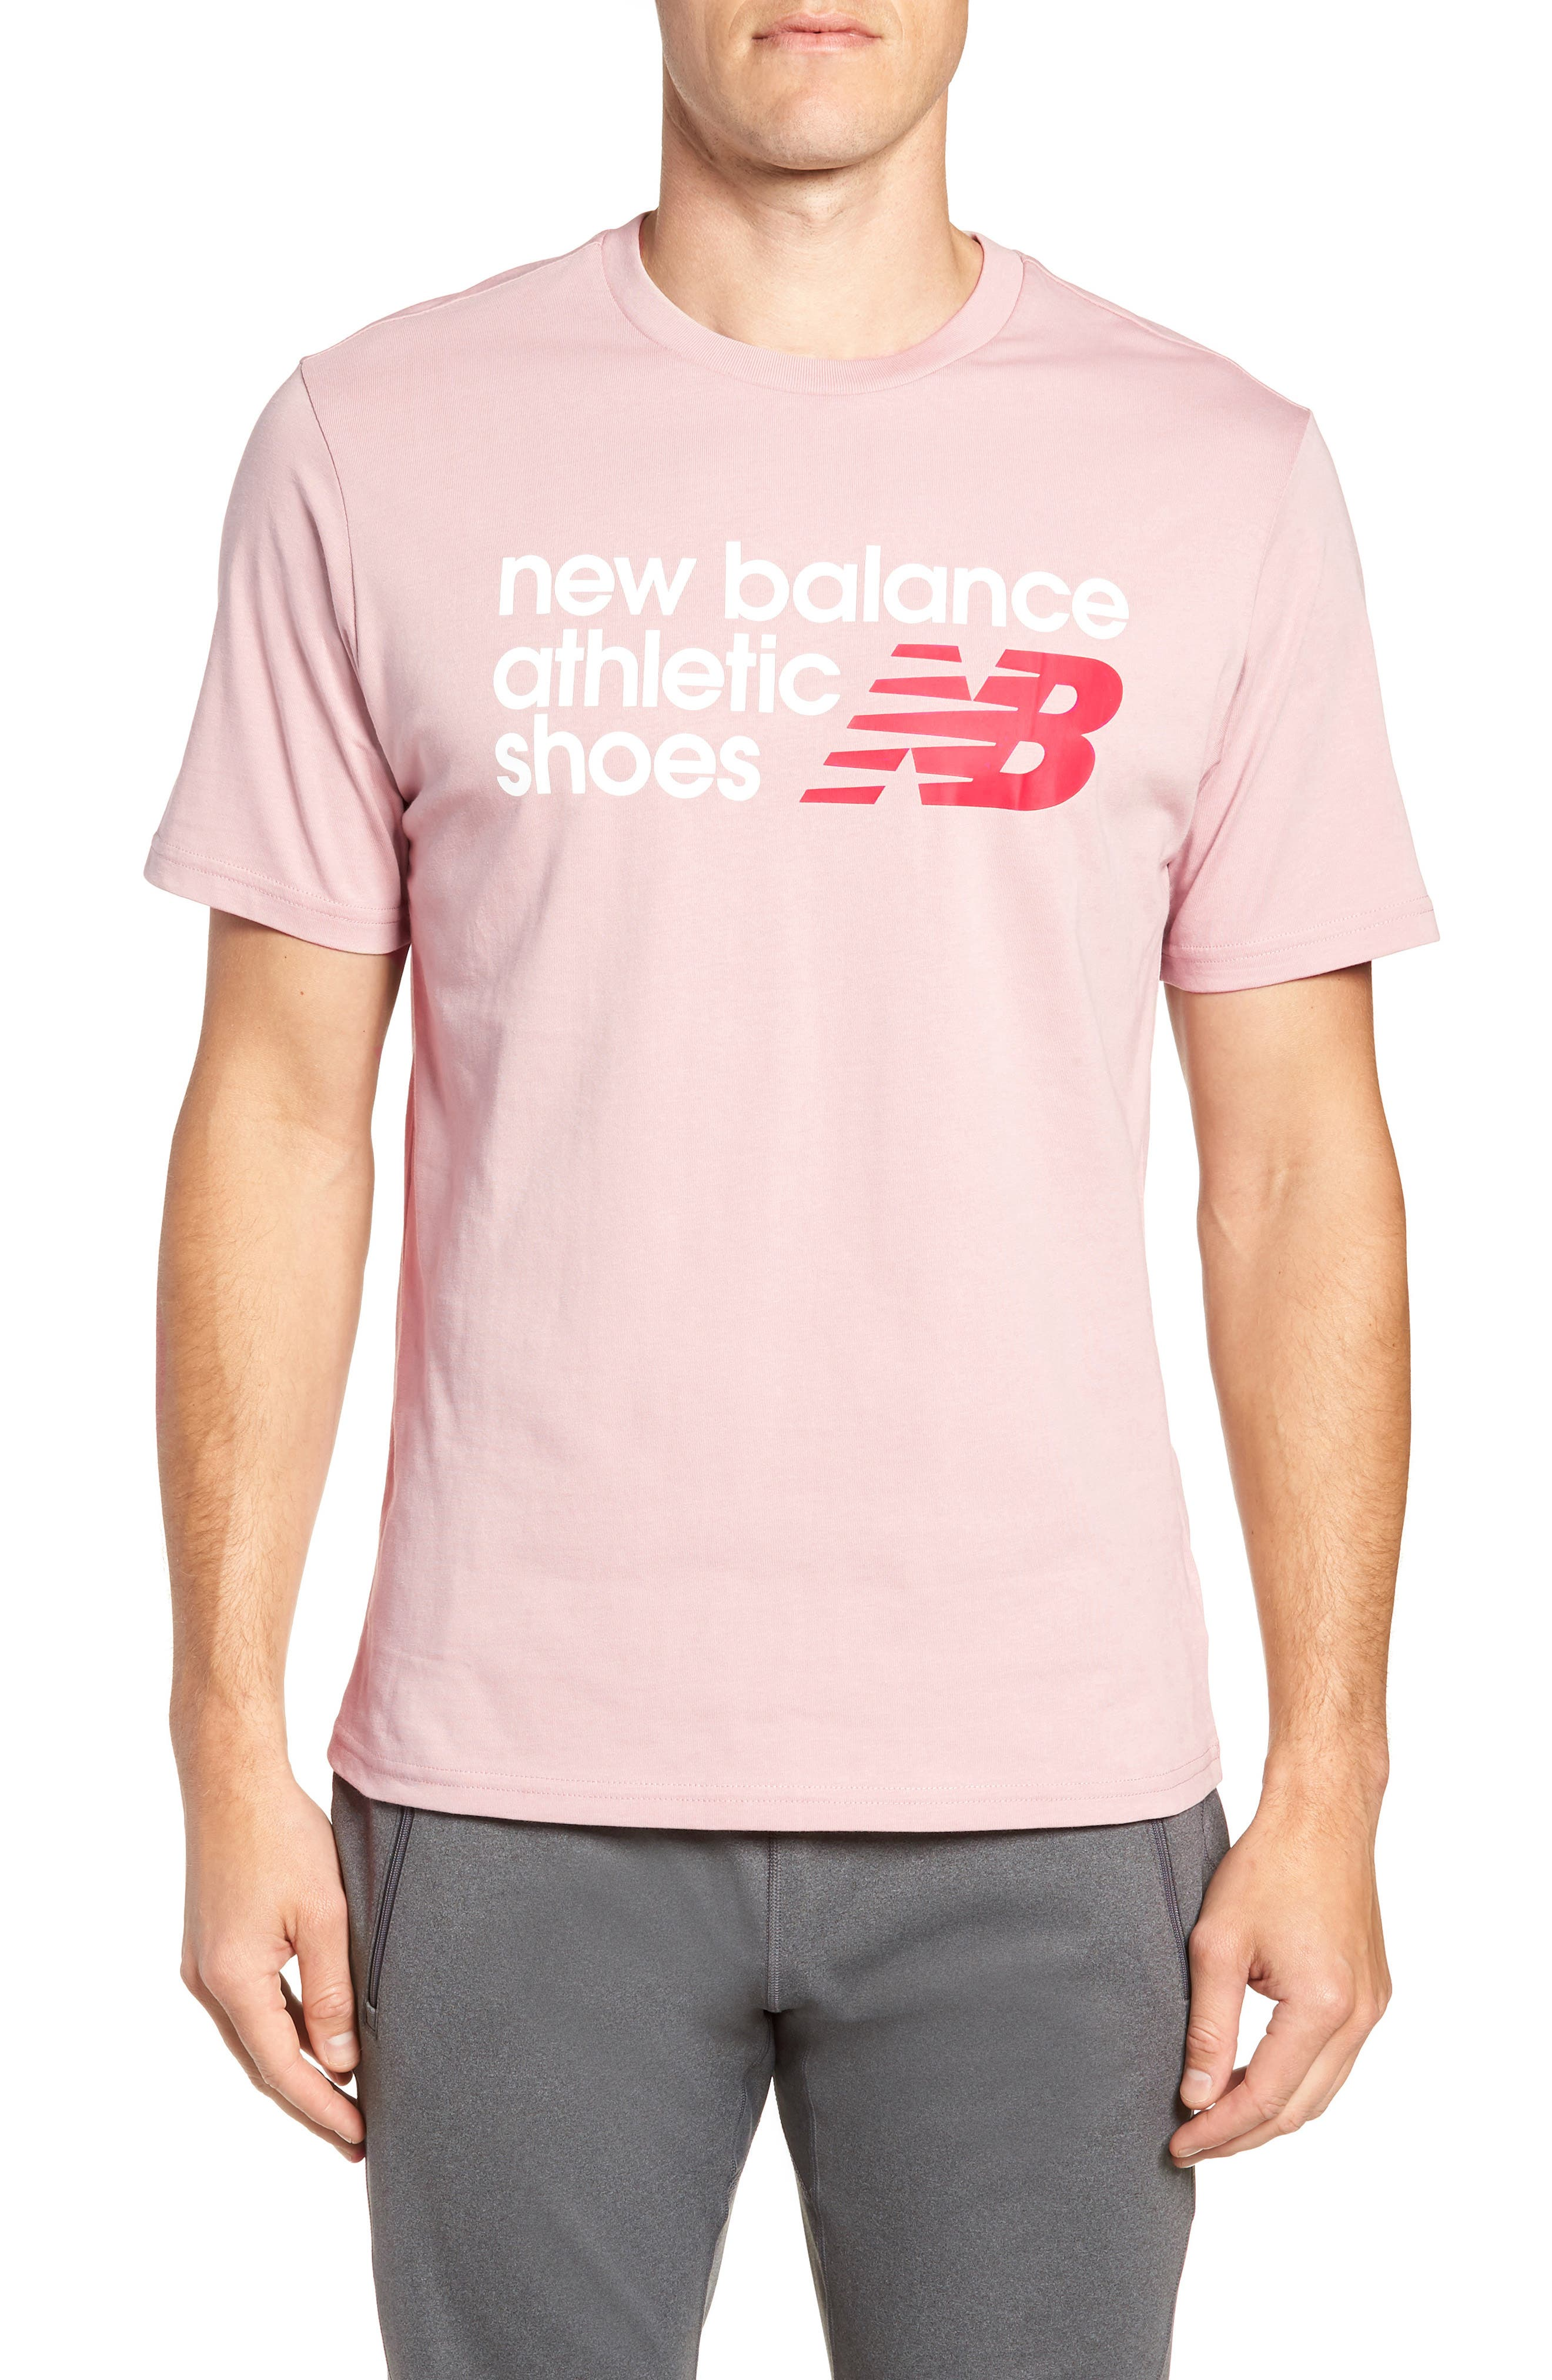 New Balance Nb Shoe Box Graphic T-Shirt, Pink